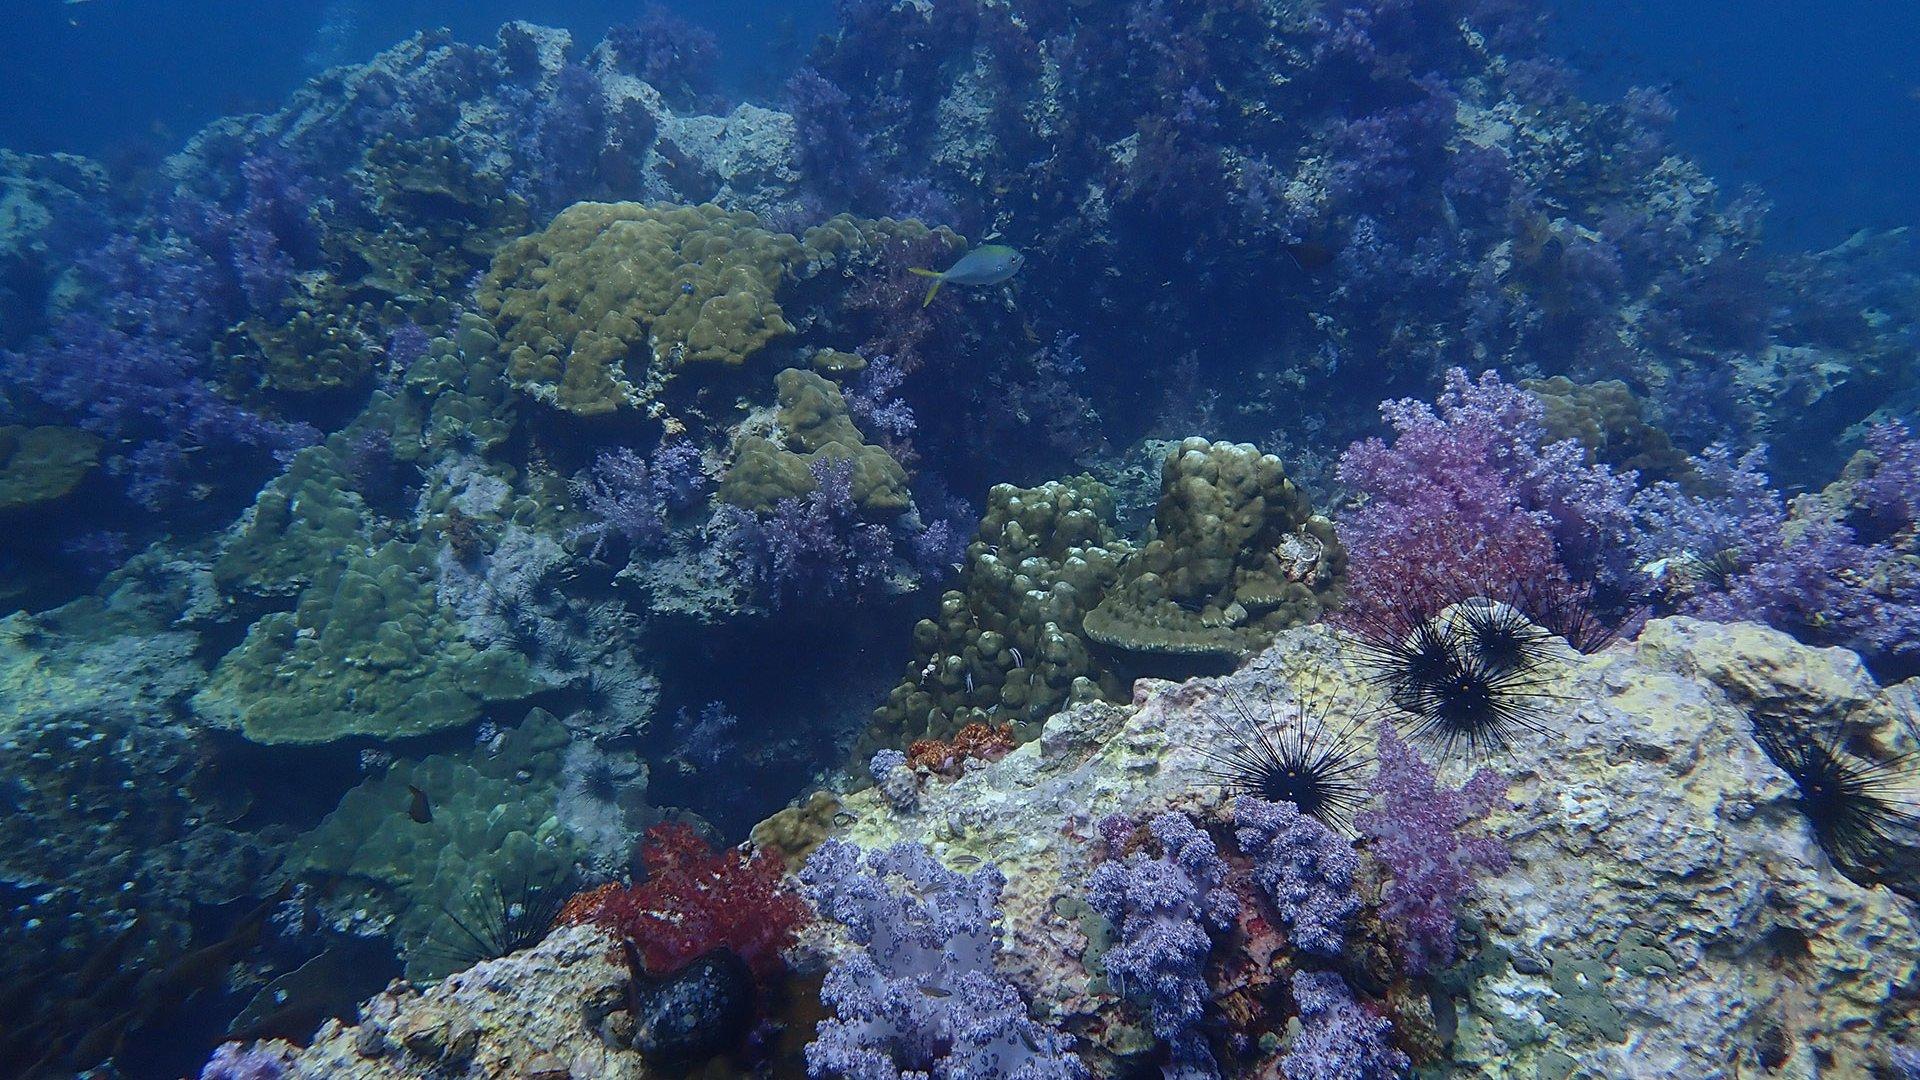 King Cruiser Wreck & Shark Point Speedboat Dive Charter from Phuket